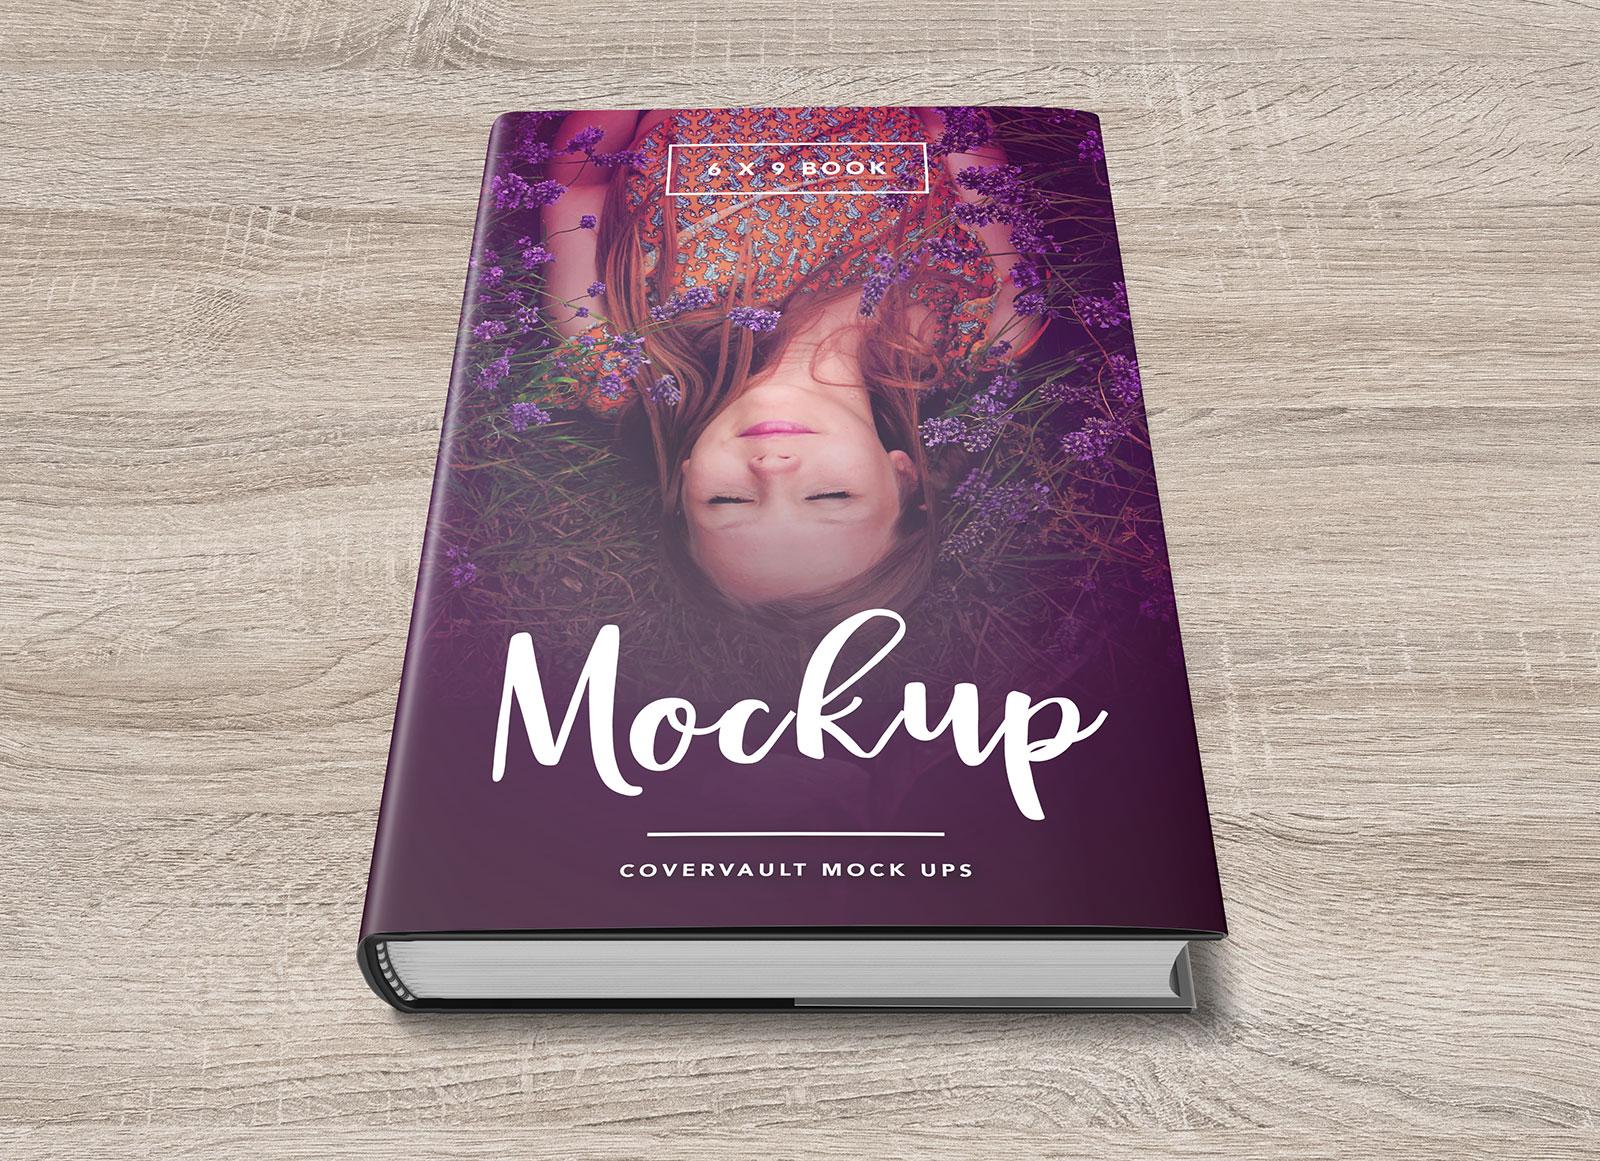 Children S Book Cover Mockup : Free hardcover dust jacket book mockup psd good mockups